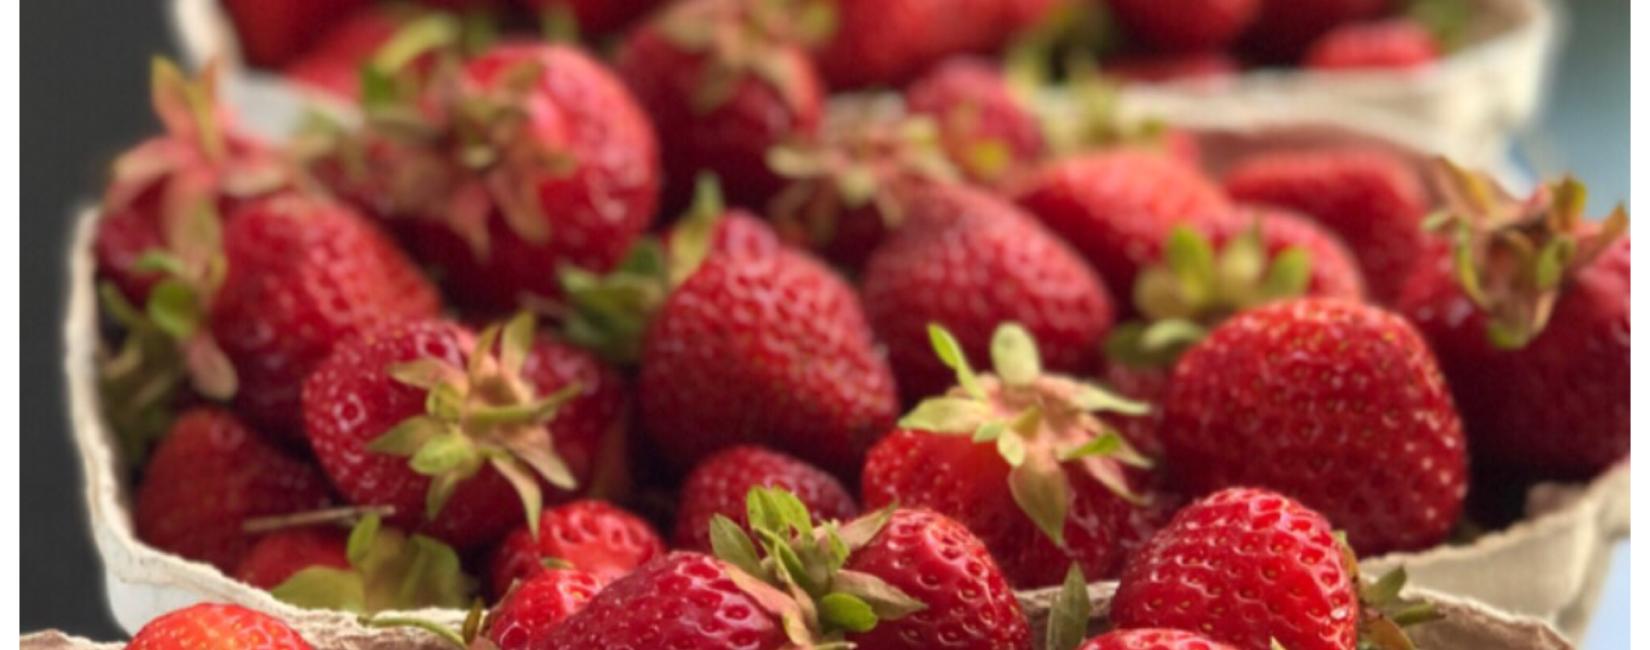 Den søde jordbærsæson